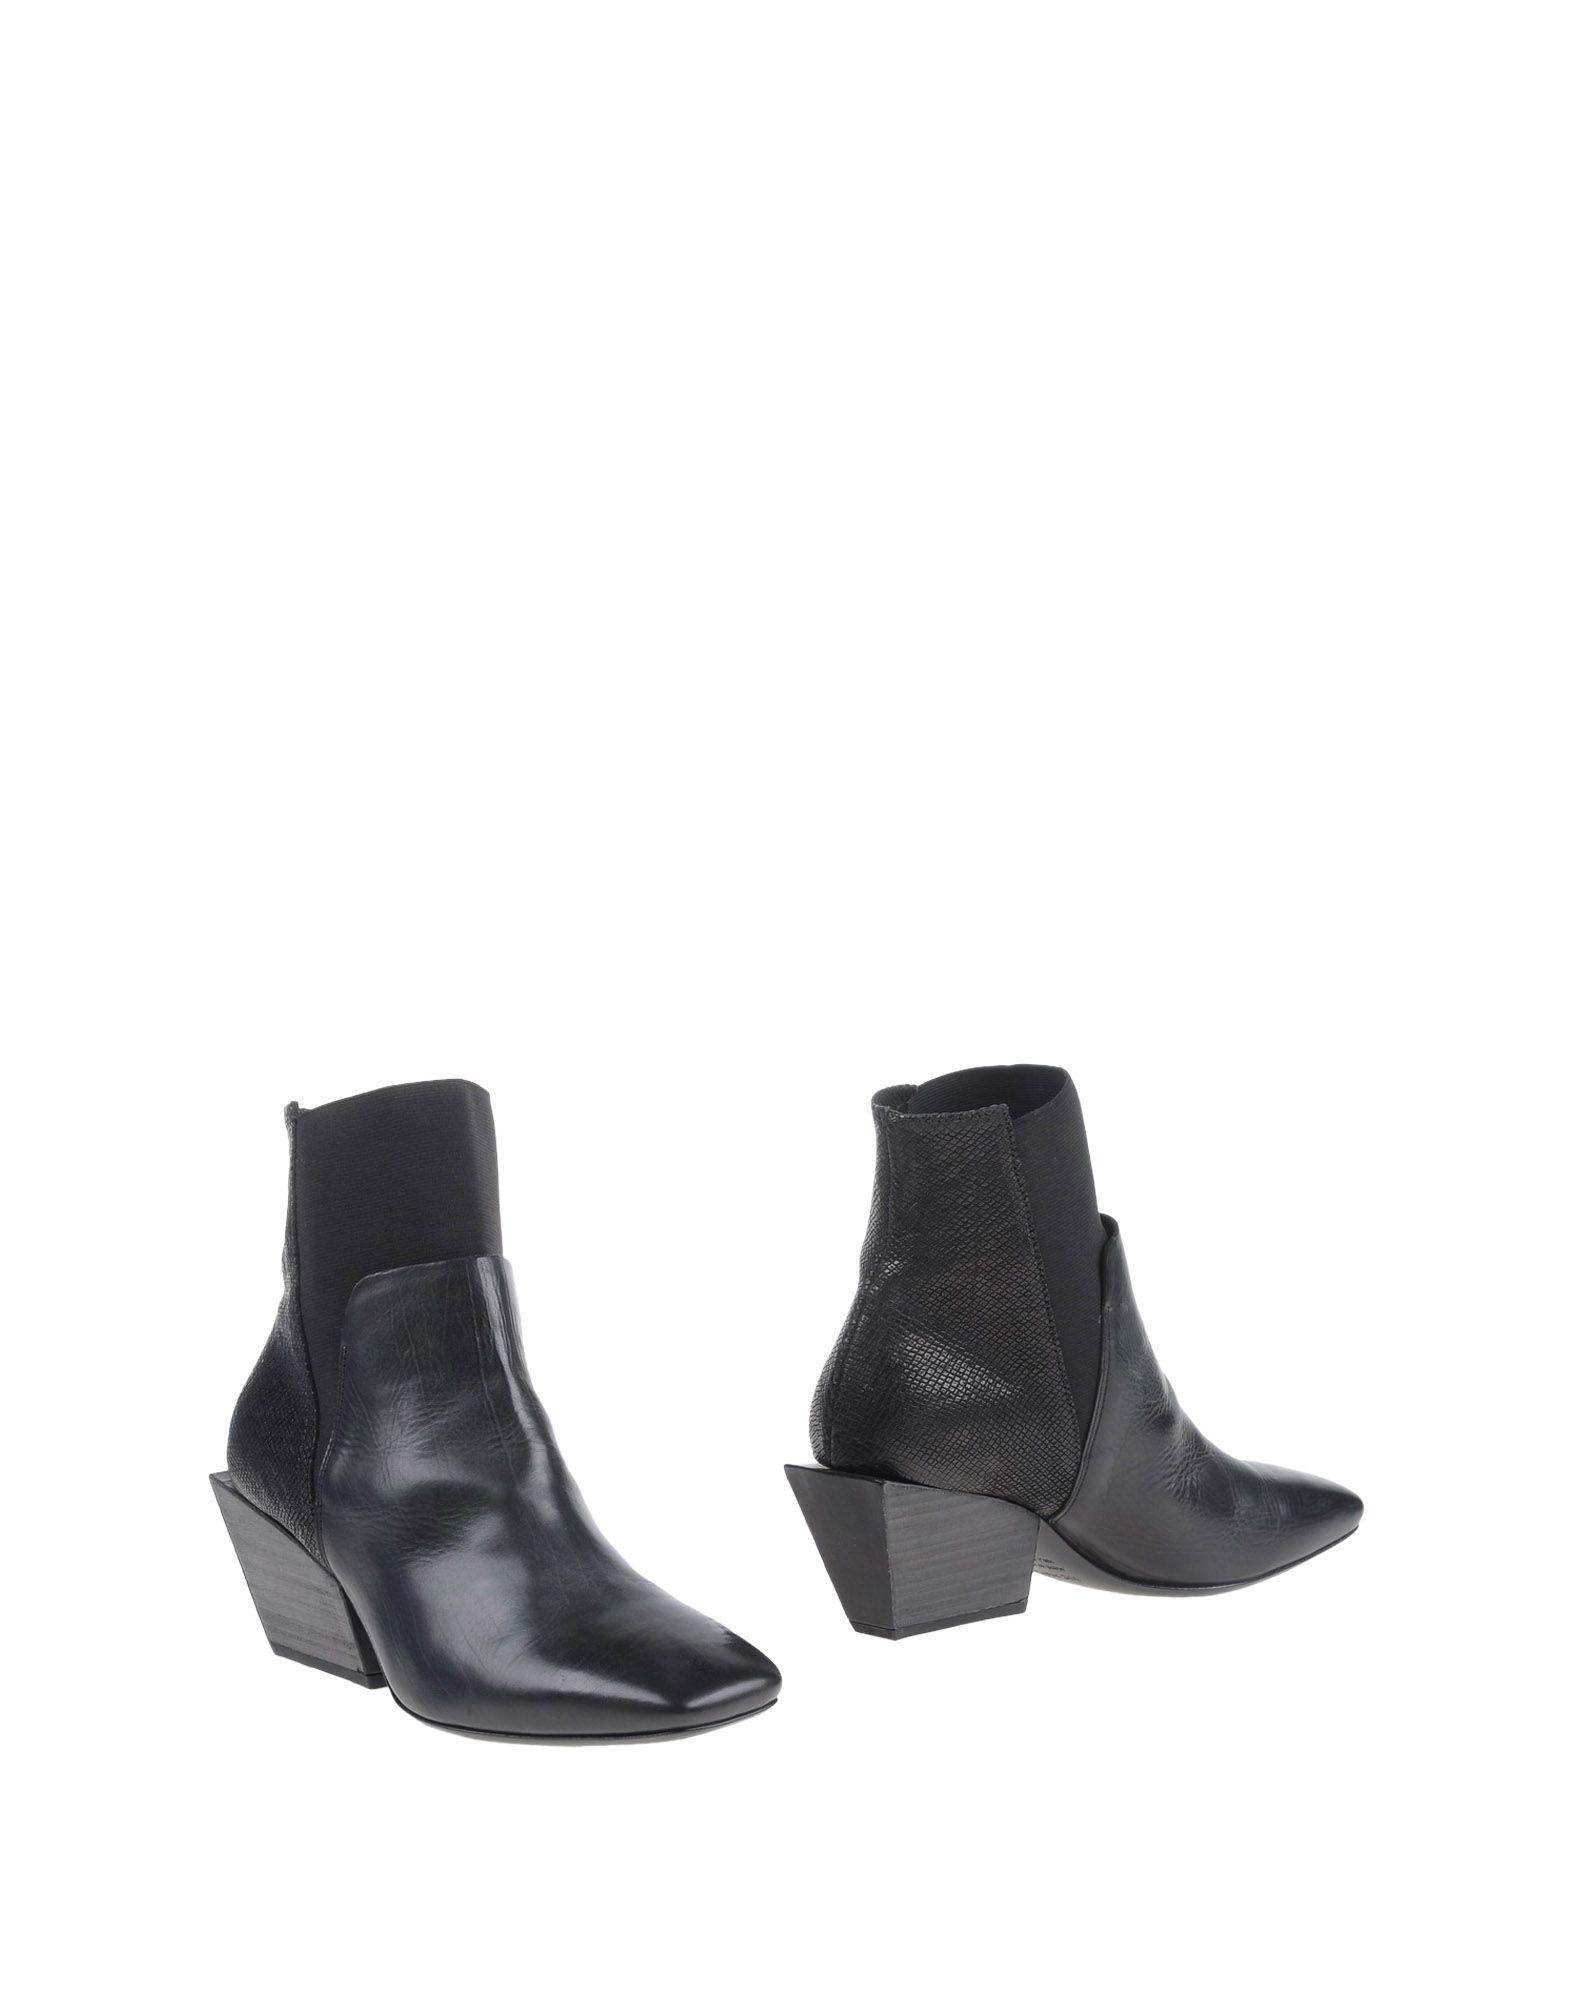 Vic Matiē Stiefelette Damen  11015804BKGut aussehende strapazierfähige Schuhe